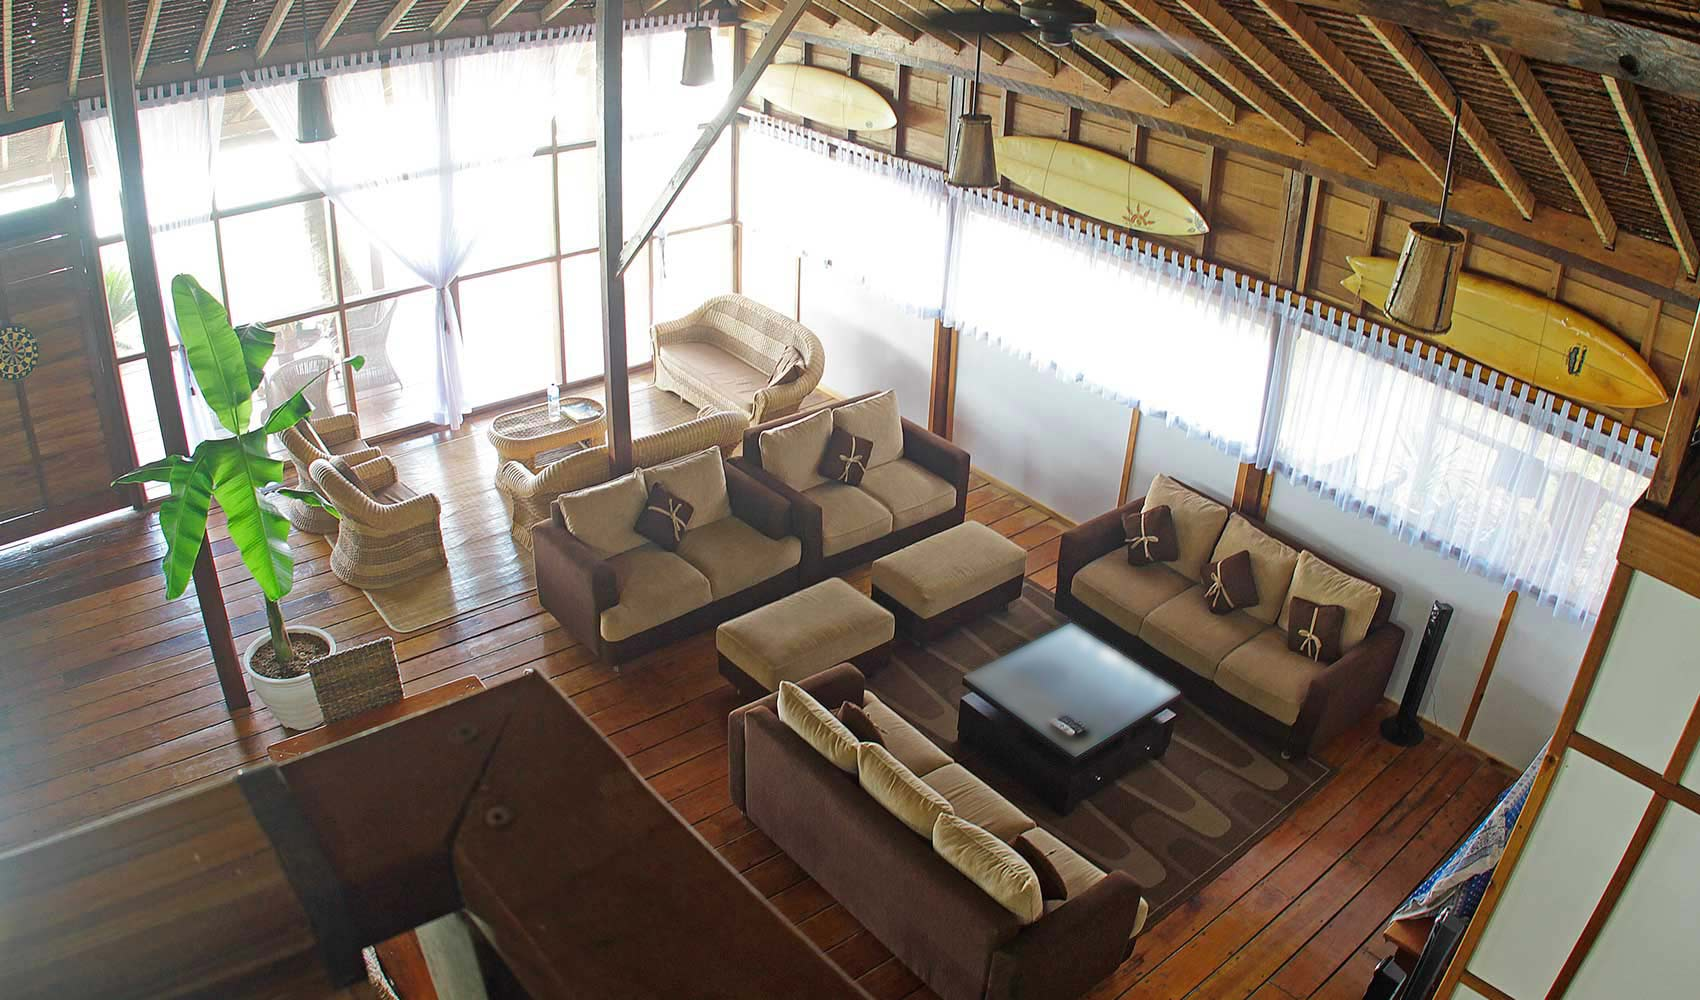 Telo_Island_Lodge_Lounge.jpg